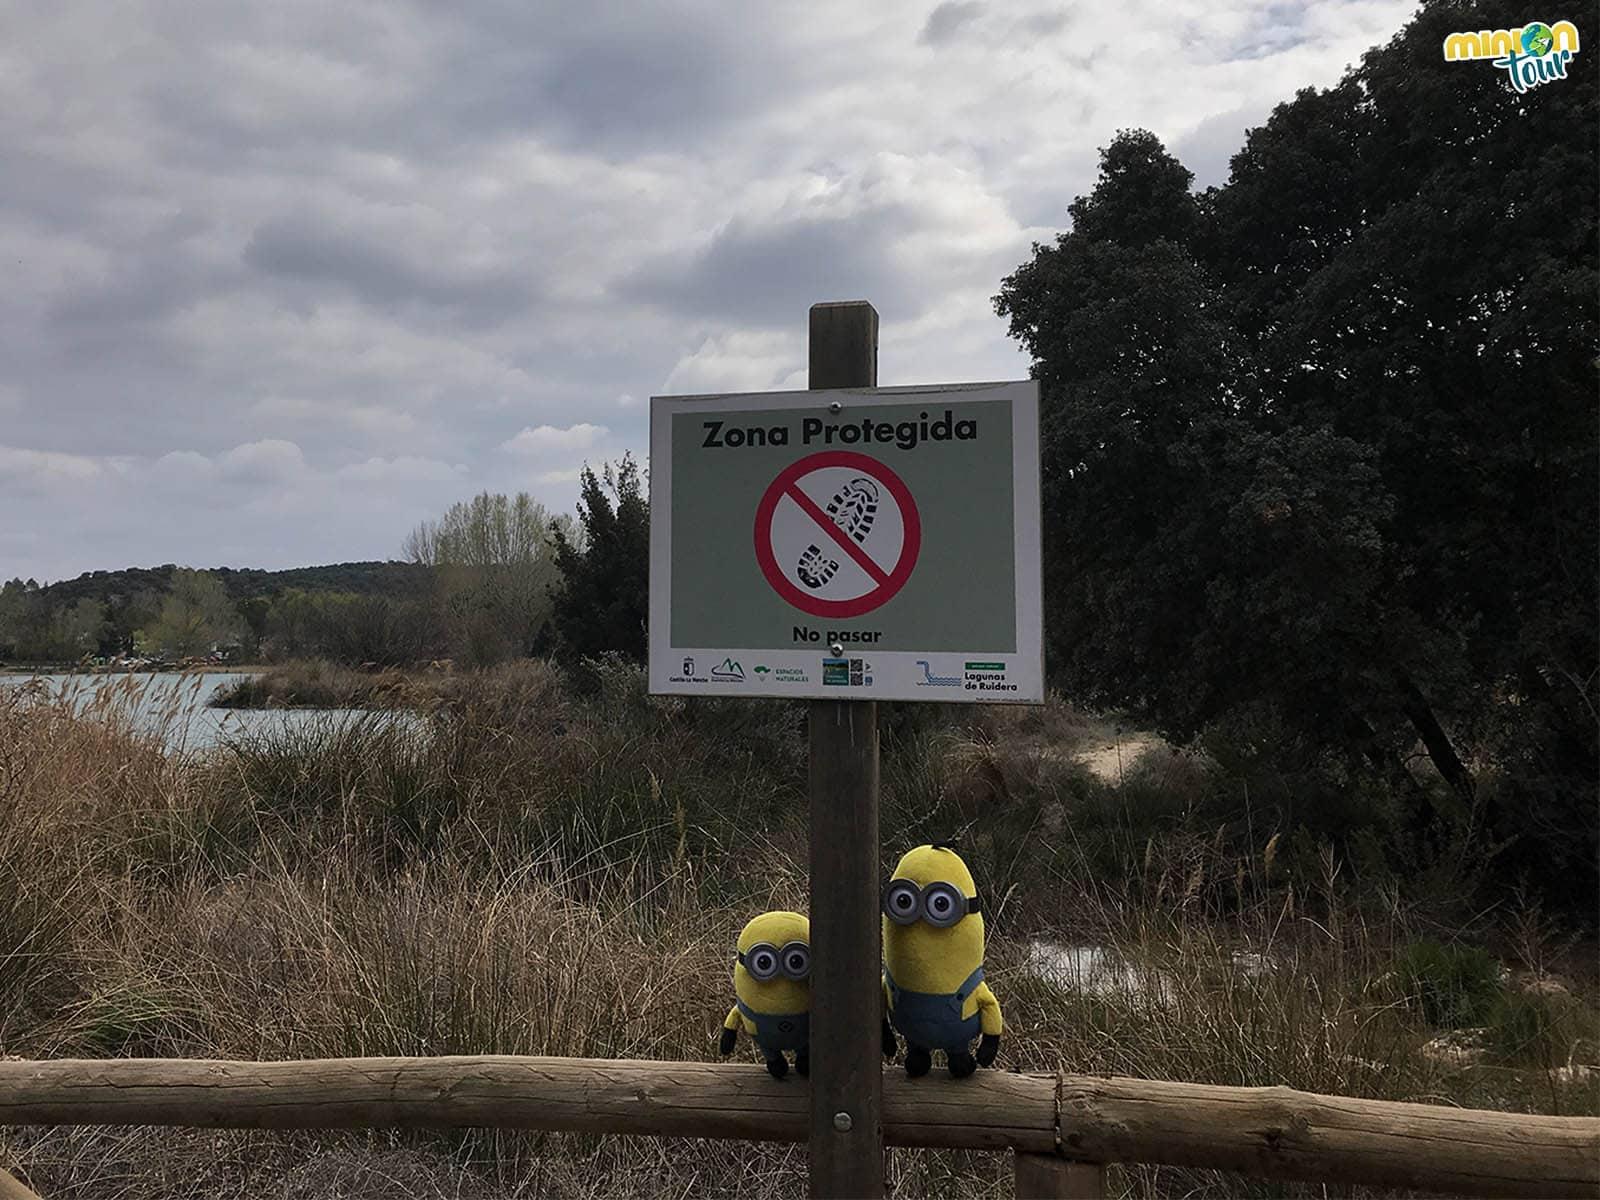 Zona protegida de las lagunas